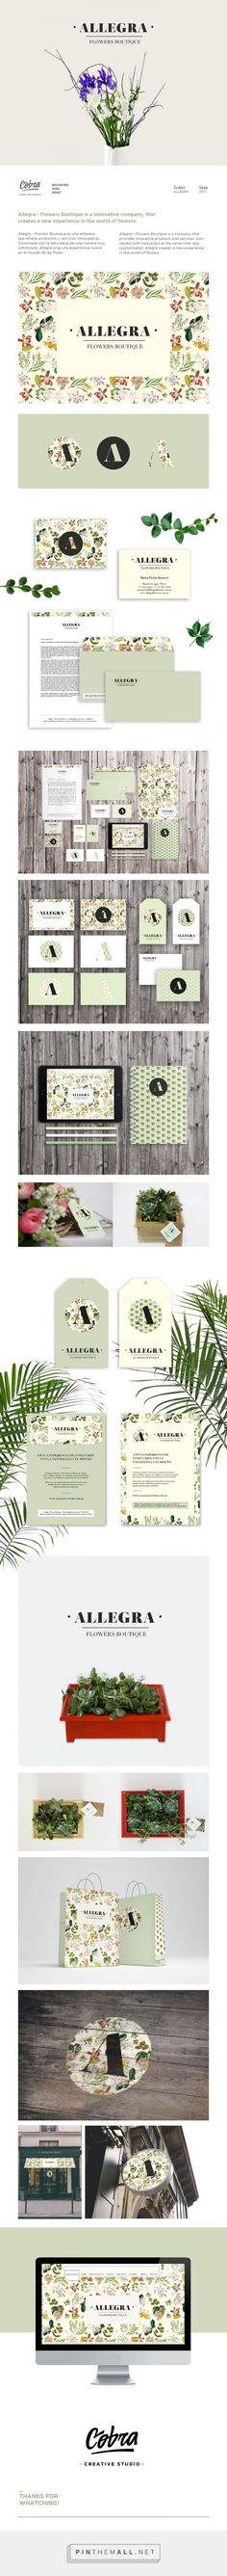 Allegra Florist Branding by Cobra Studio | Fivestar Branding Agency – Design and Branding Agency & Curated Inspiration Gallery